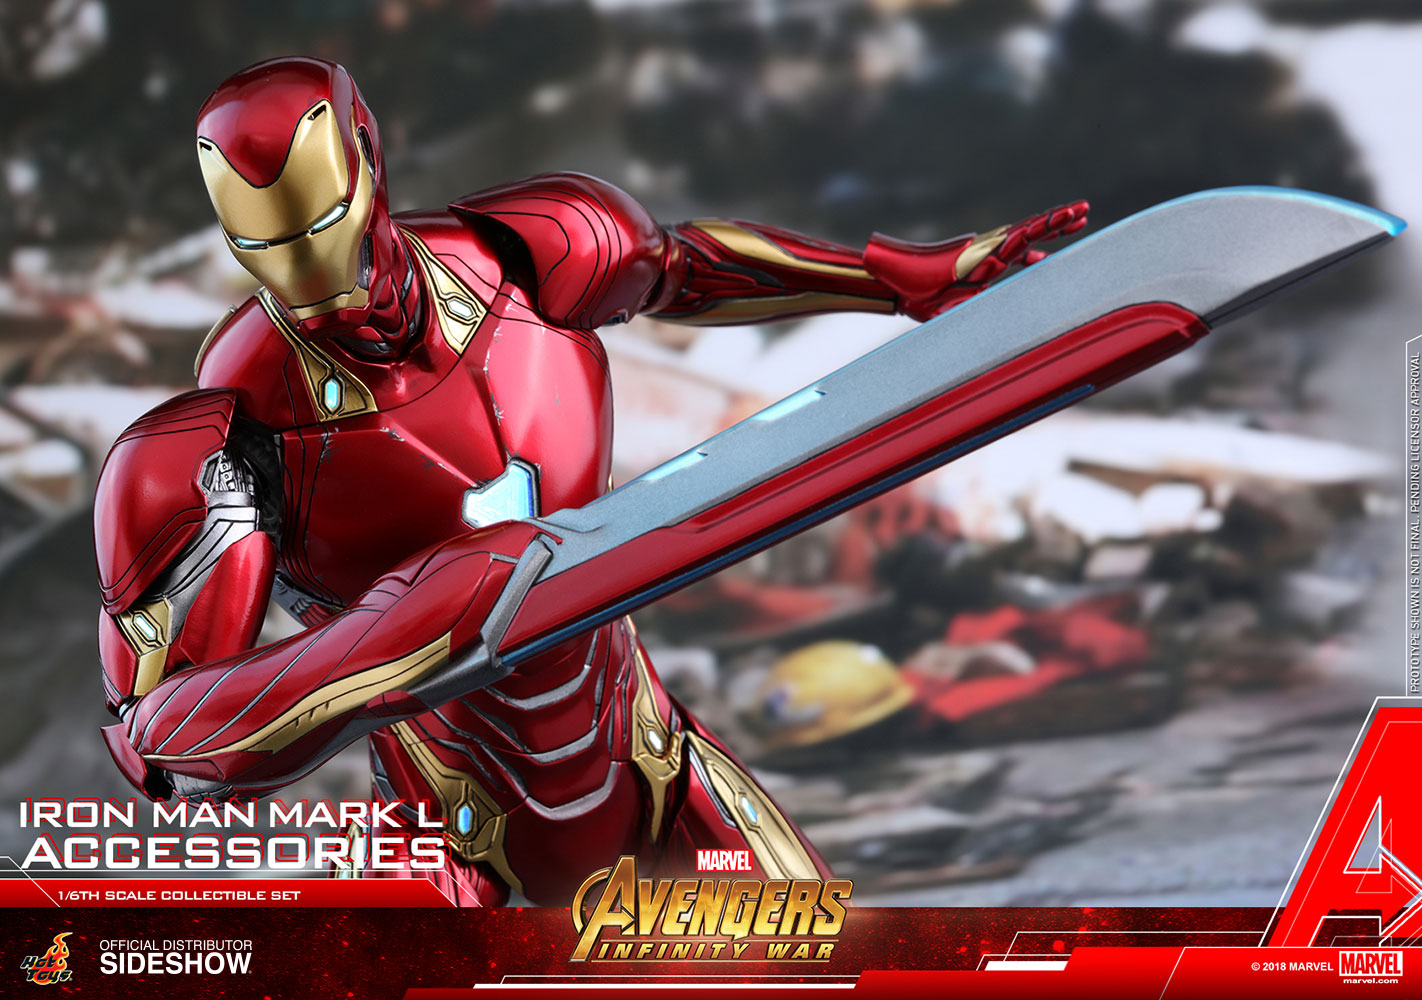 marvel-avengers-infinity-war-iron-man-mark-l-accessories-sixth-scale-figure-hot-toys-903804-041.jpg